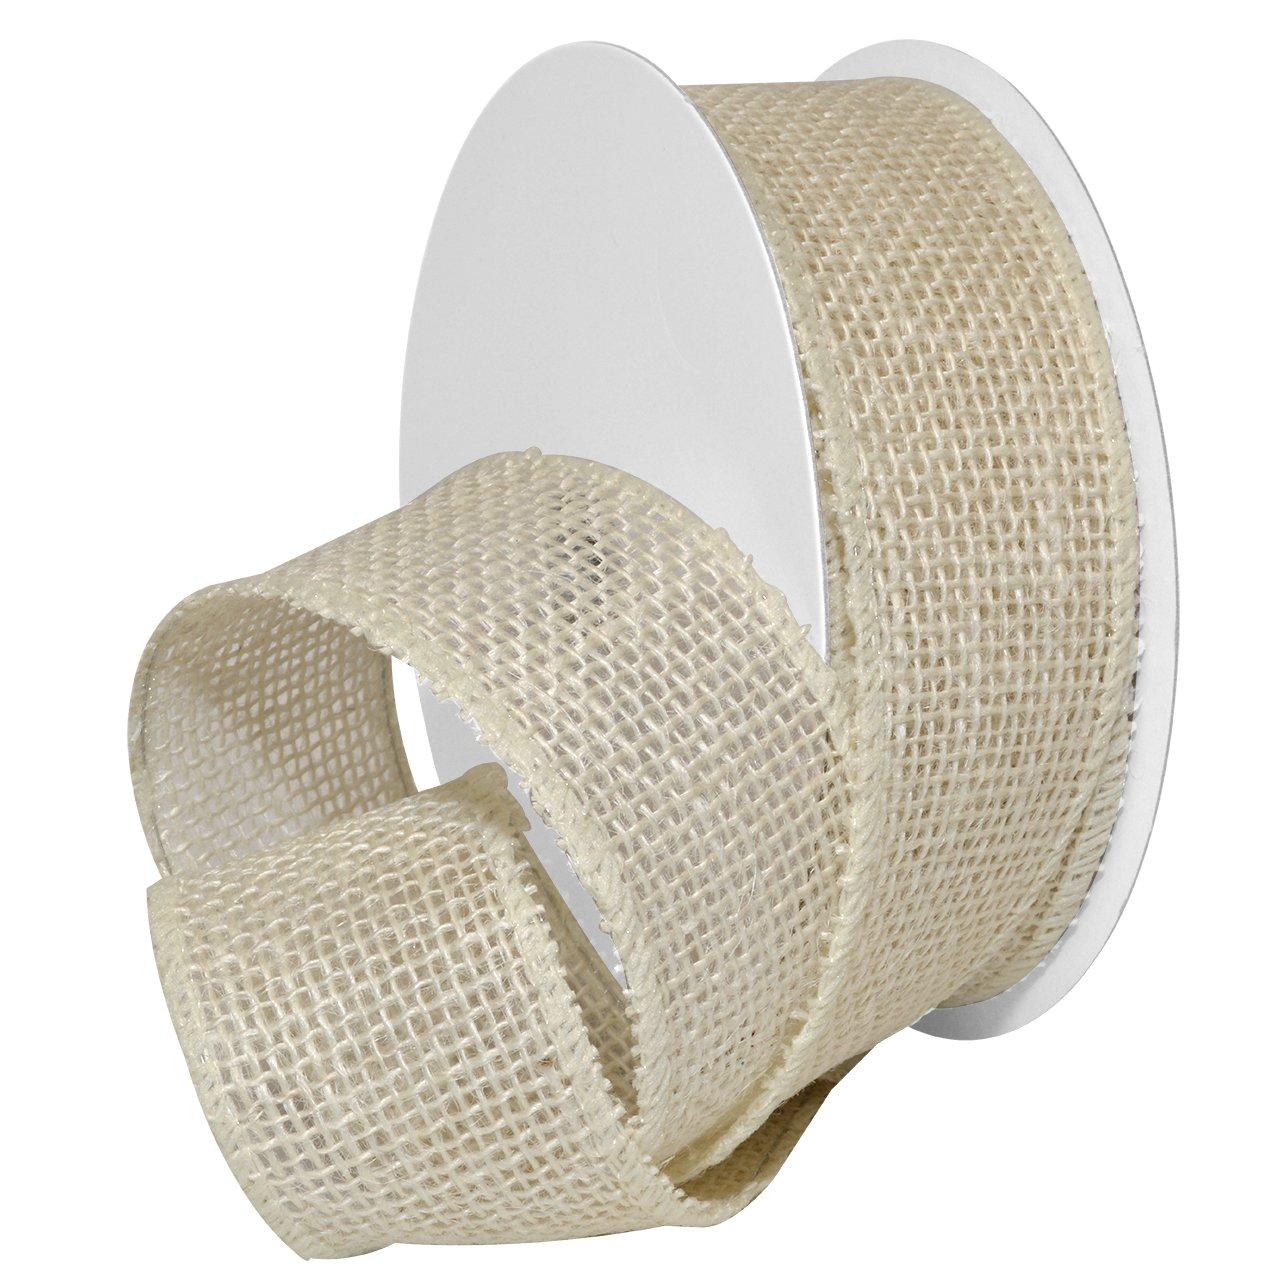 Morex Ribbon Burlap Wired Ribbon, 2-1/2-Inch by 10-Yard Spool, Orange 1252.60/10-620